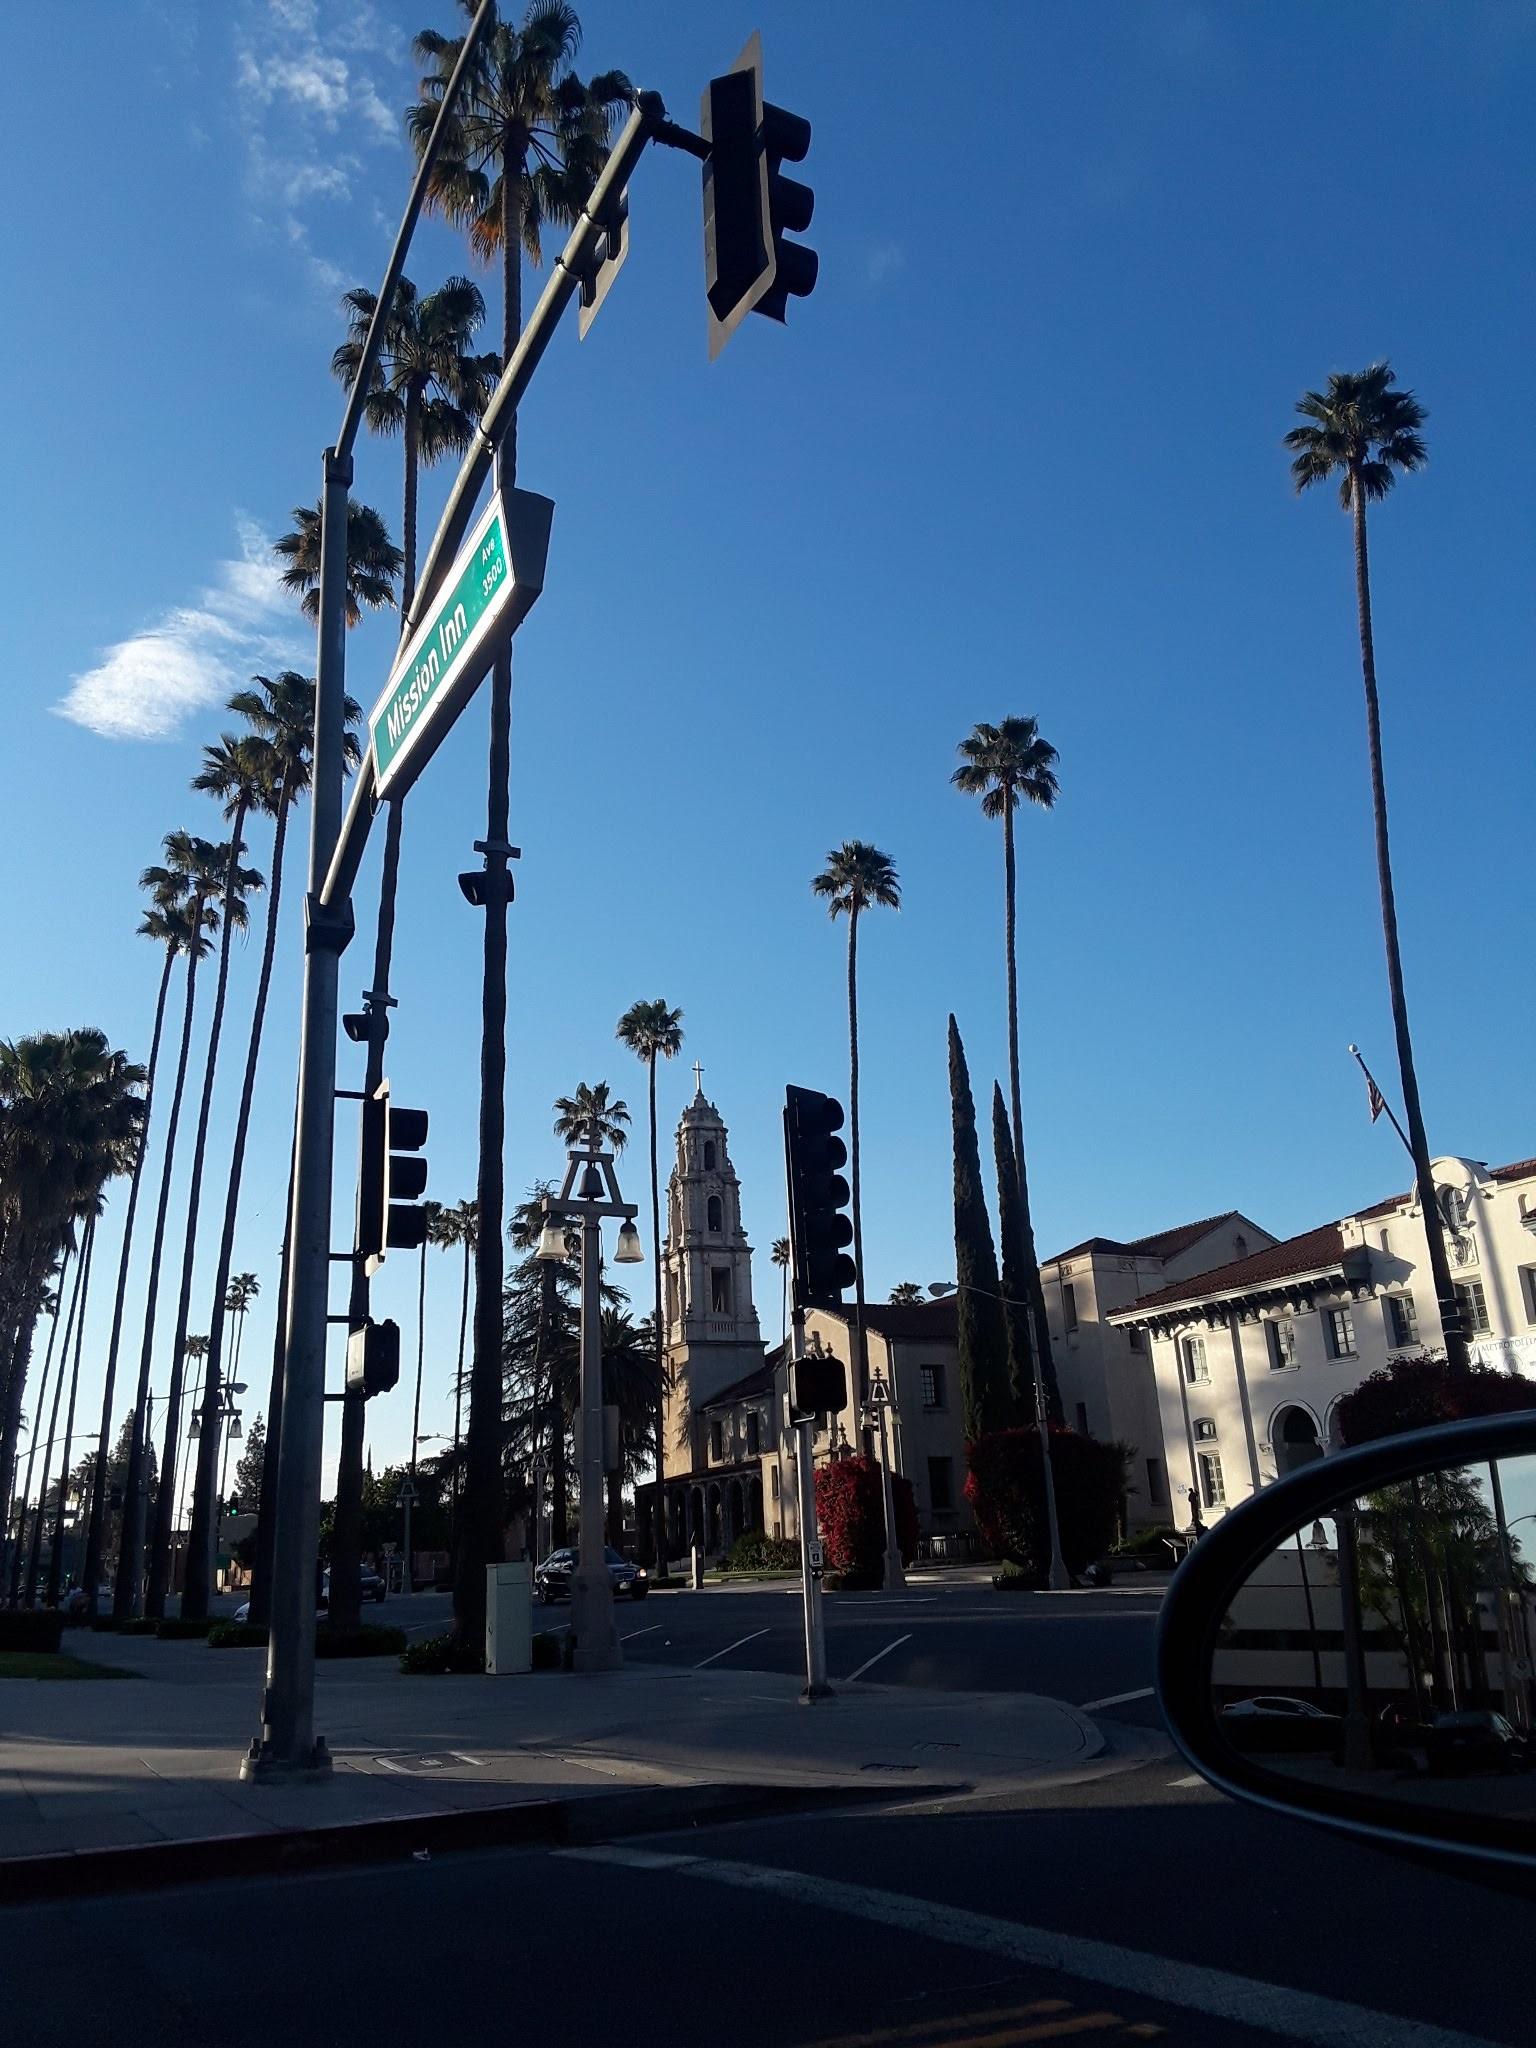 street corner palm trees and raincross logo